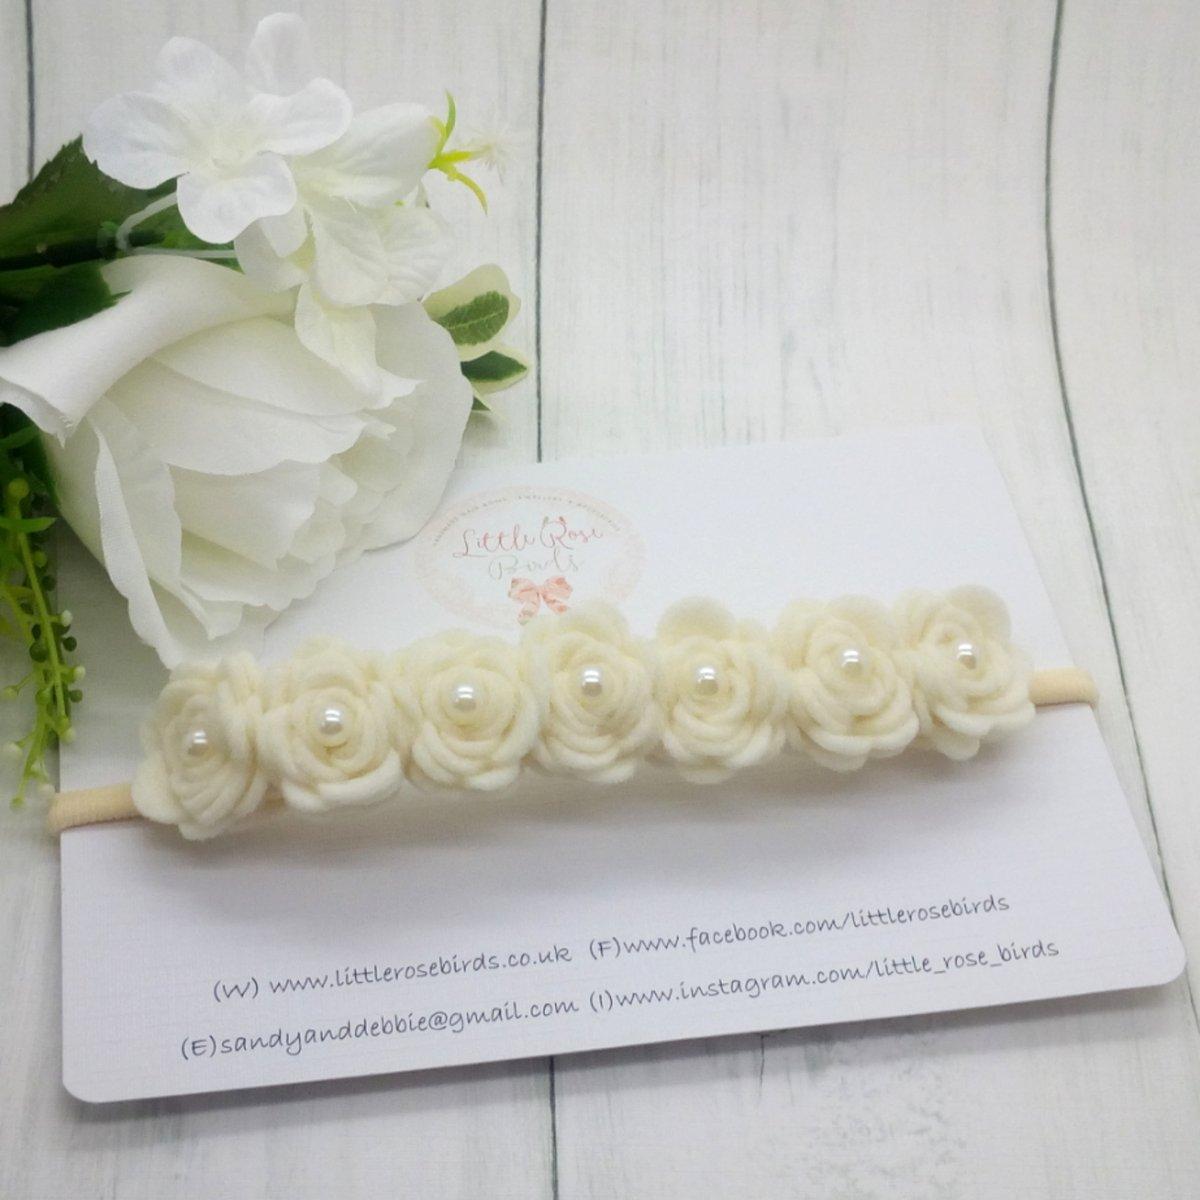 Image of Luxury Ivory Rose Headband - 7 Rose Headband